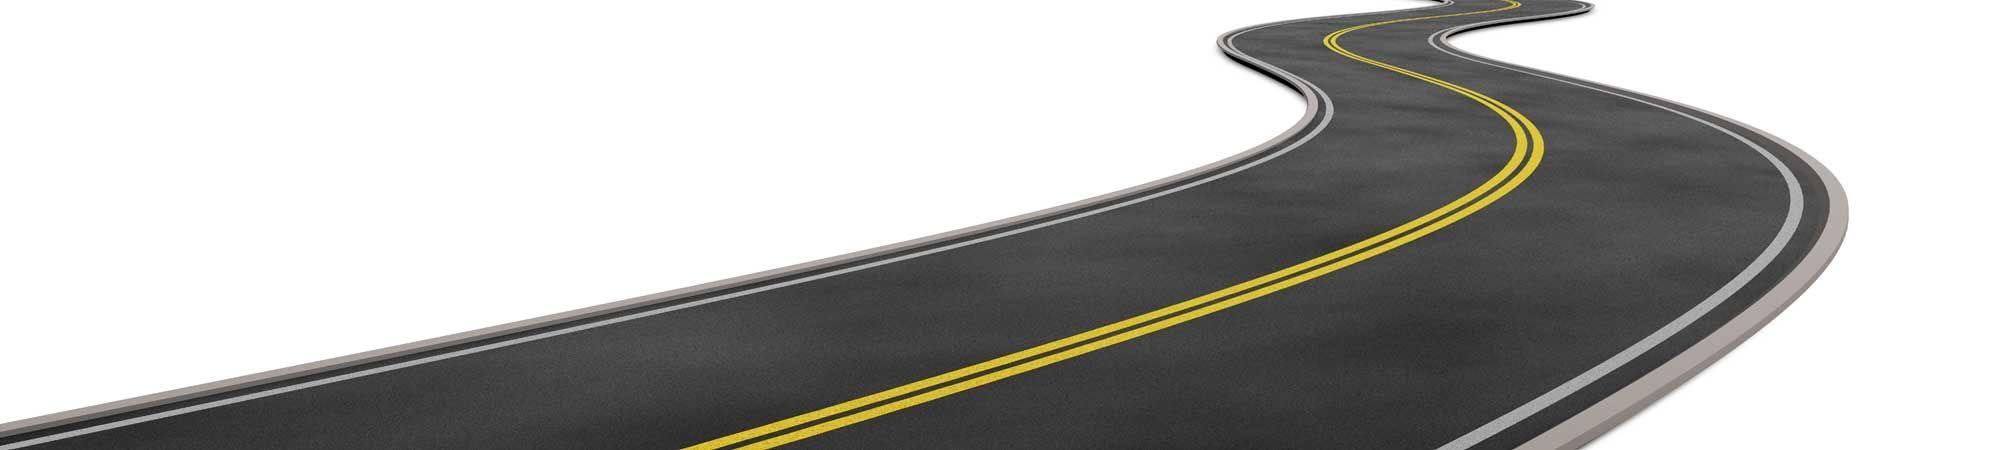 Curve Road Clipart Curve road clipart curved road